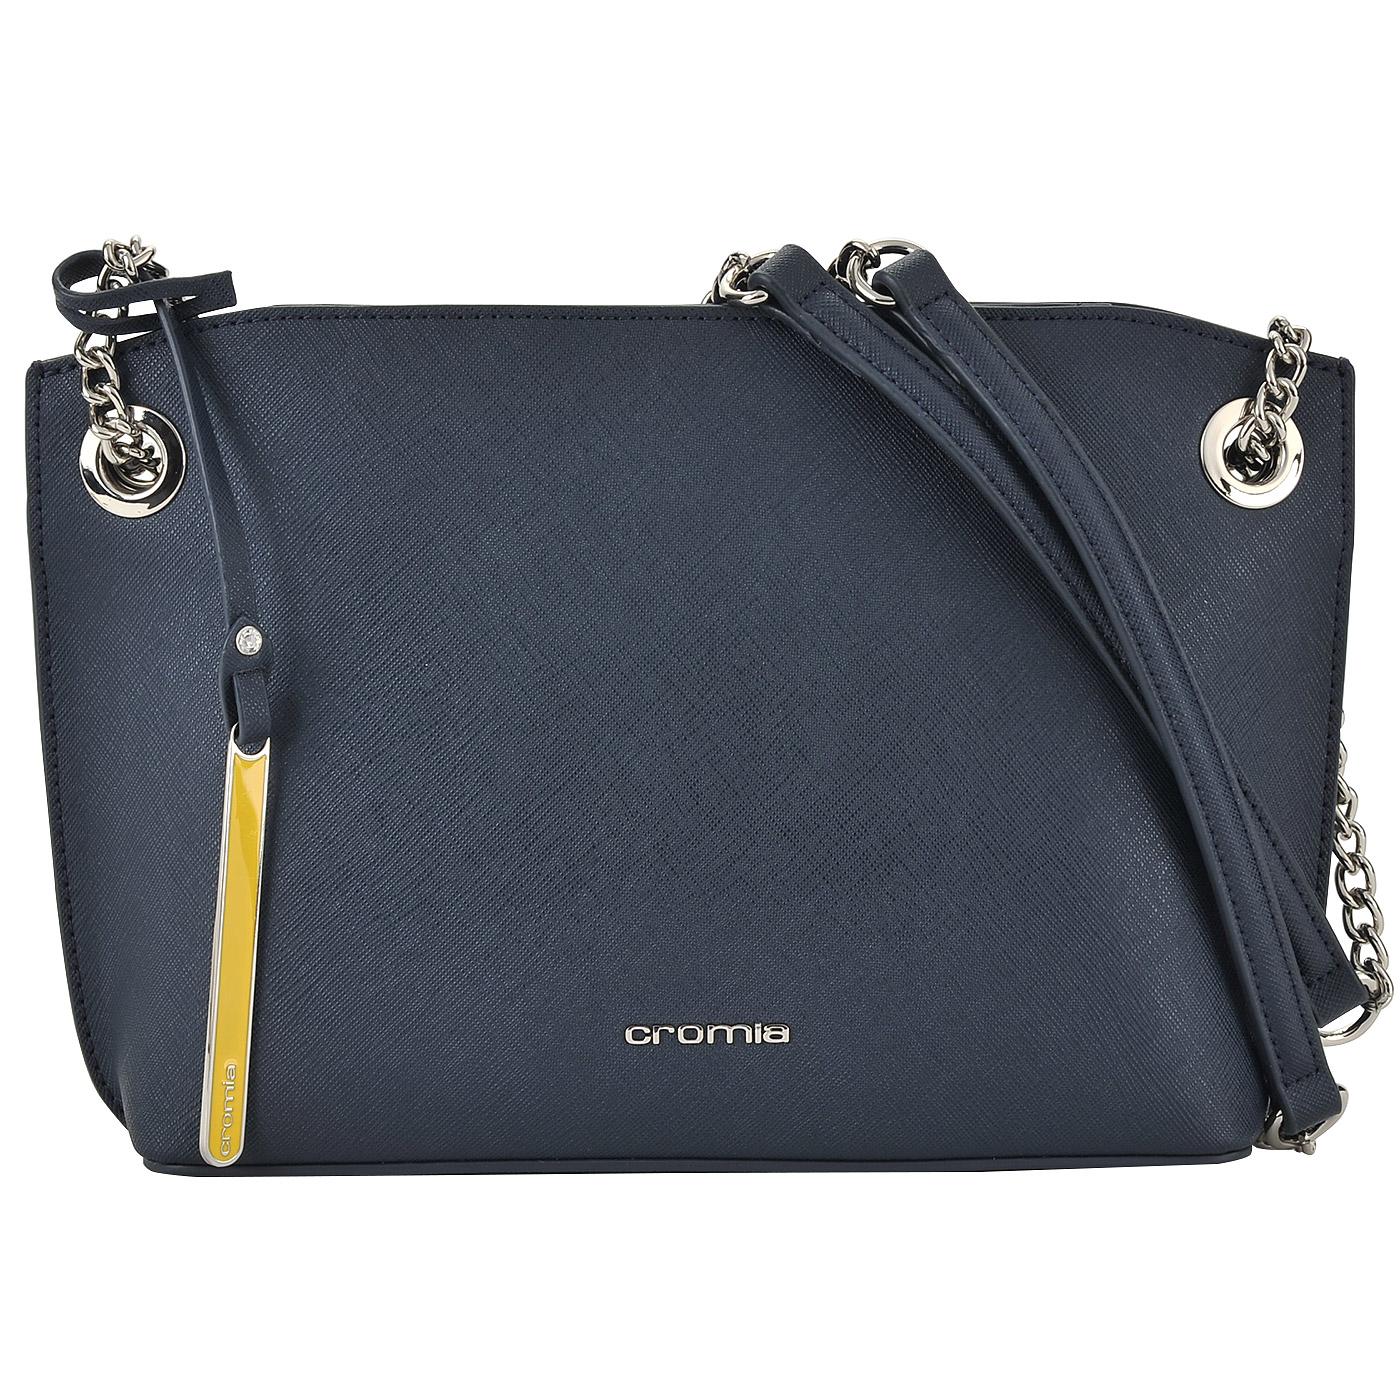 31a389d9b5dd ... Женская кожаная сумочка на цепочке через плечо Cromia Perla ...